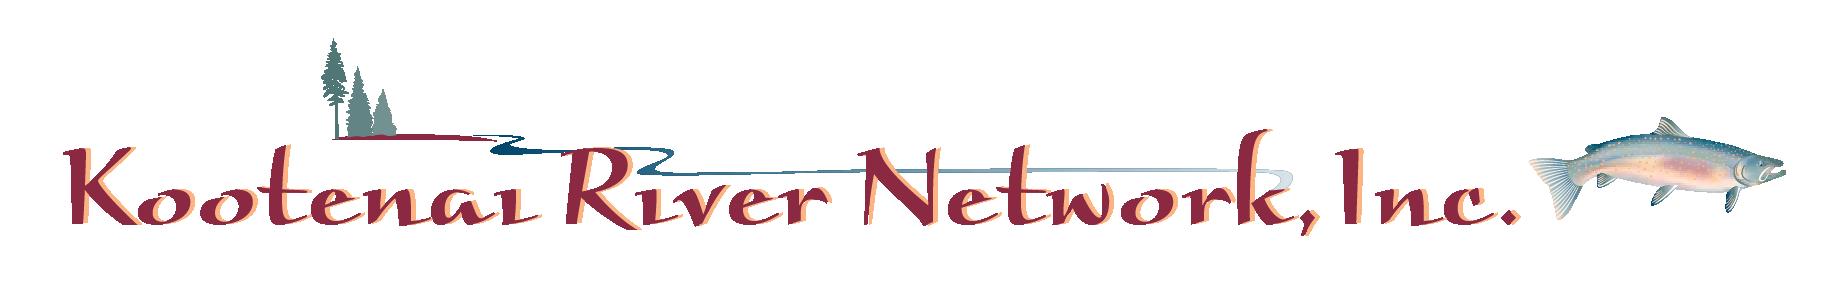 Kootenai River Network